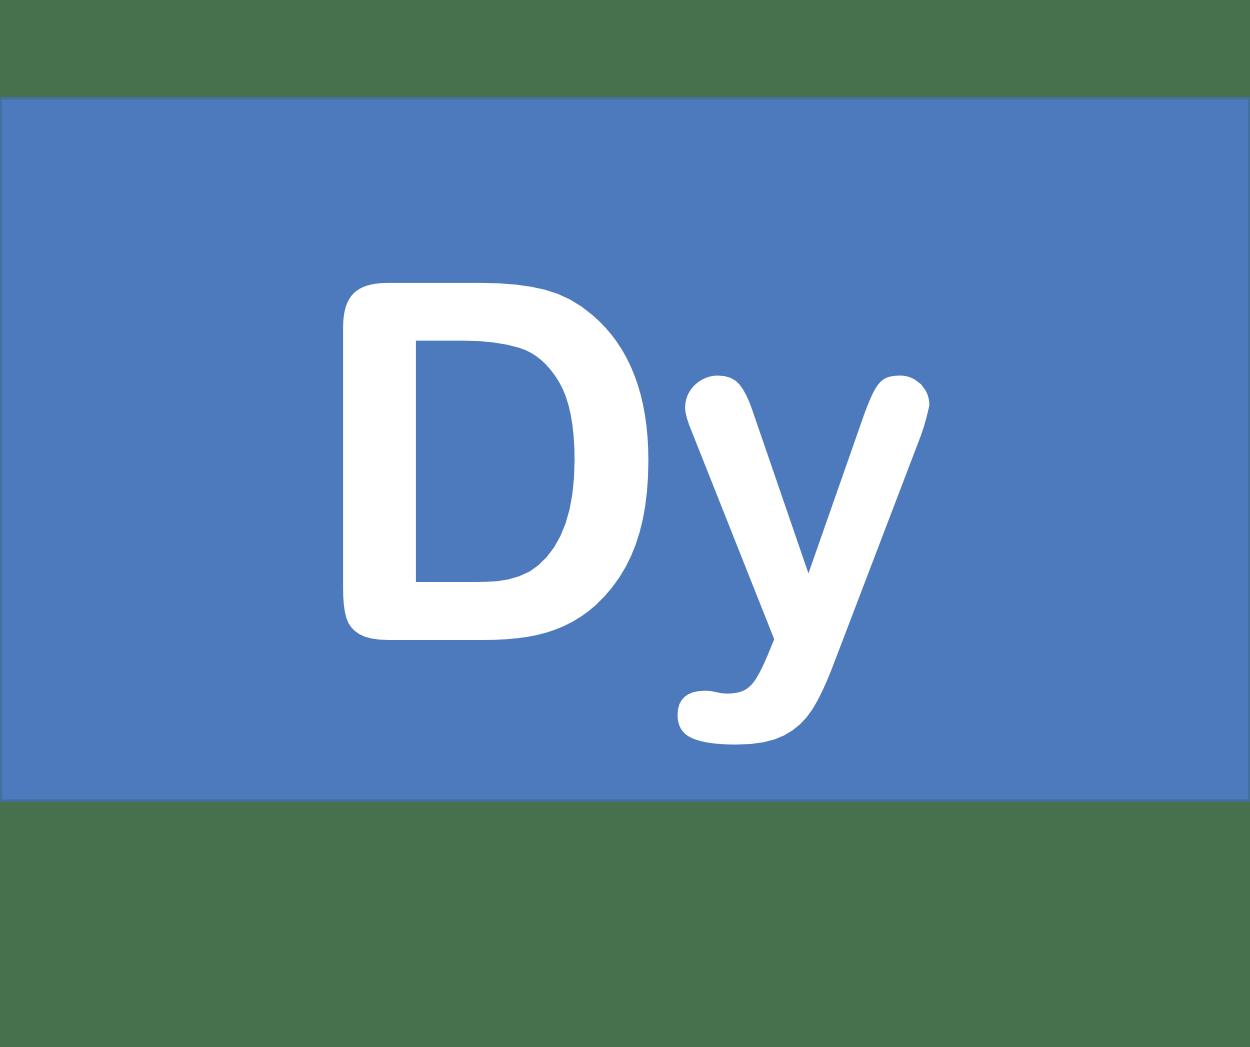 66 Dy ジスプロシウム Dysprosium 元素 記号 周期表 化学 原子